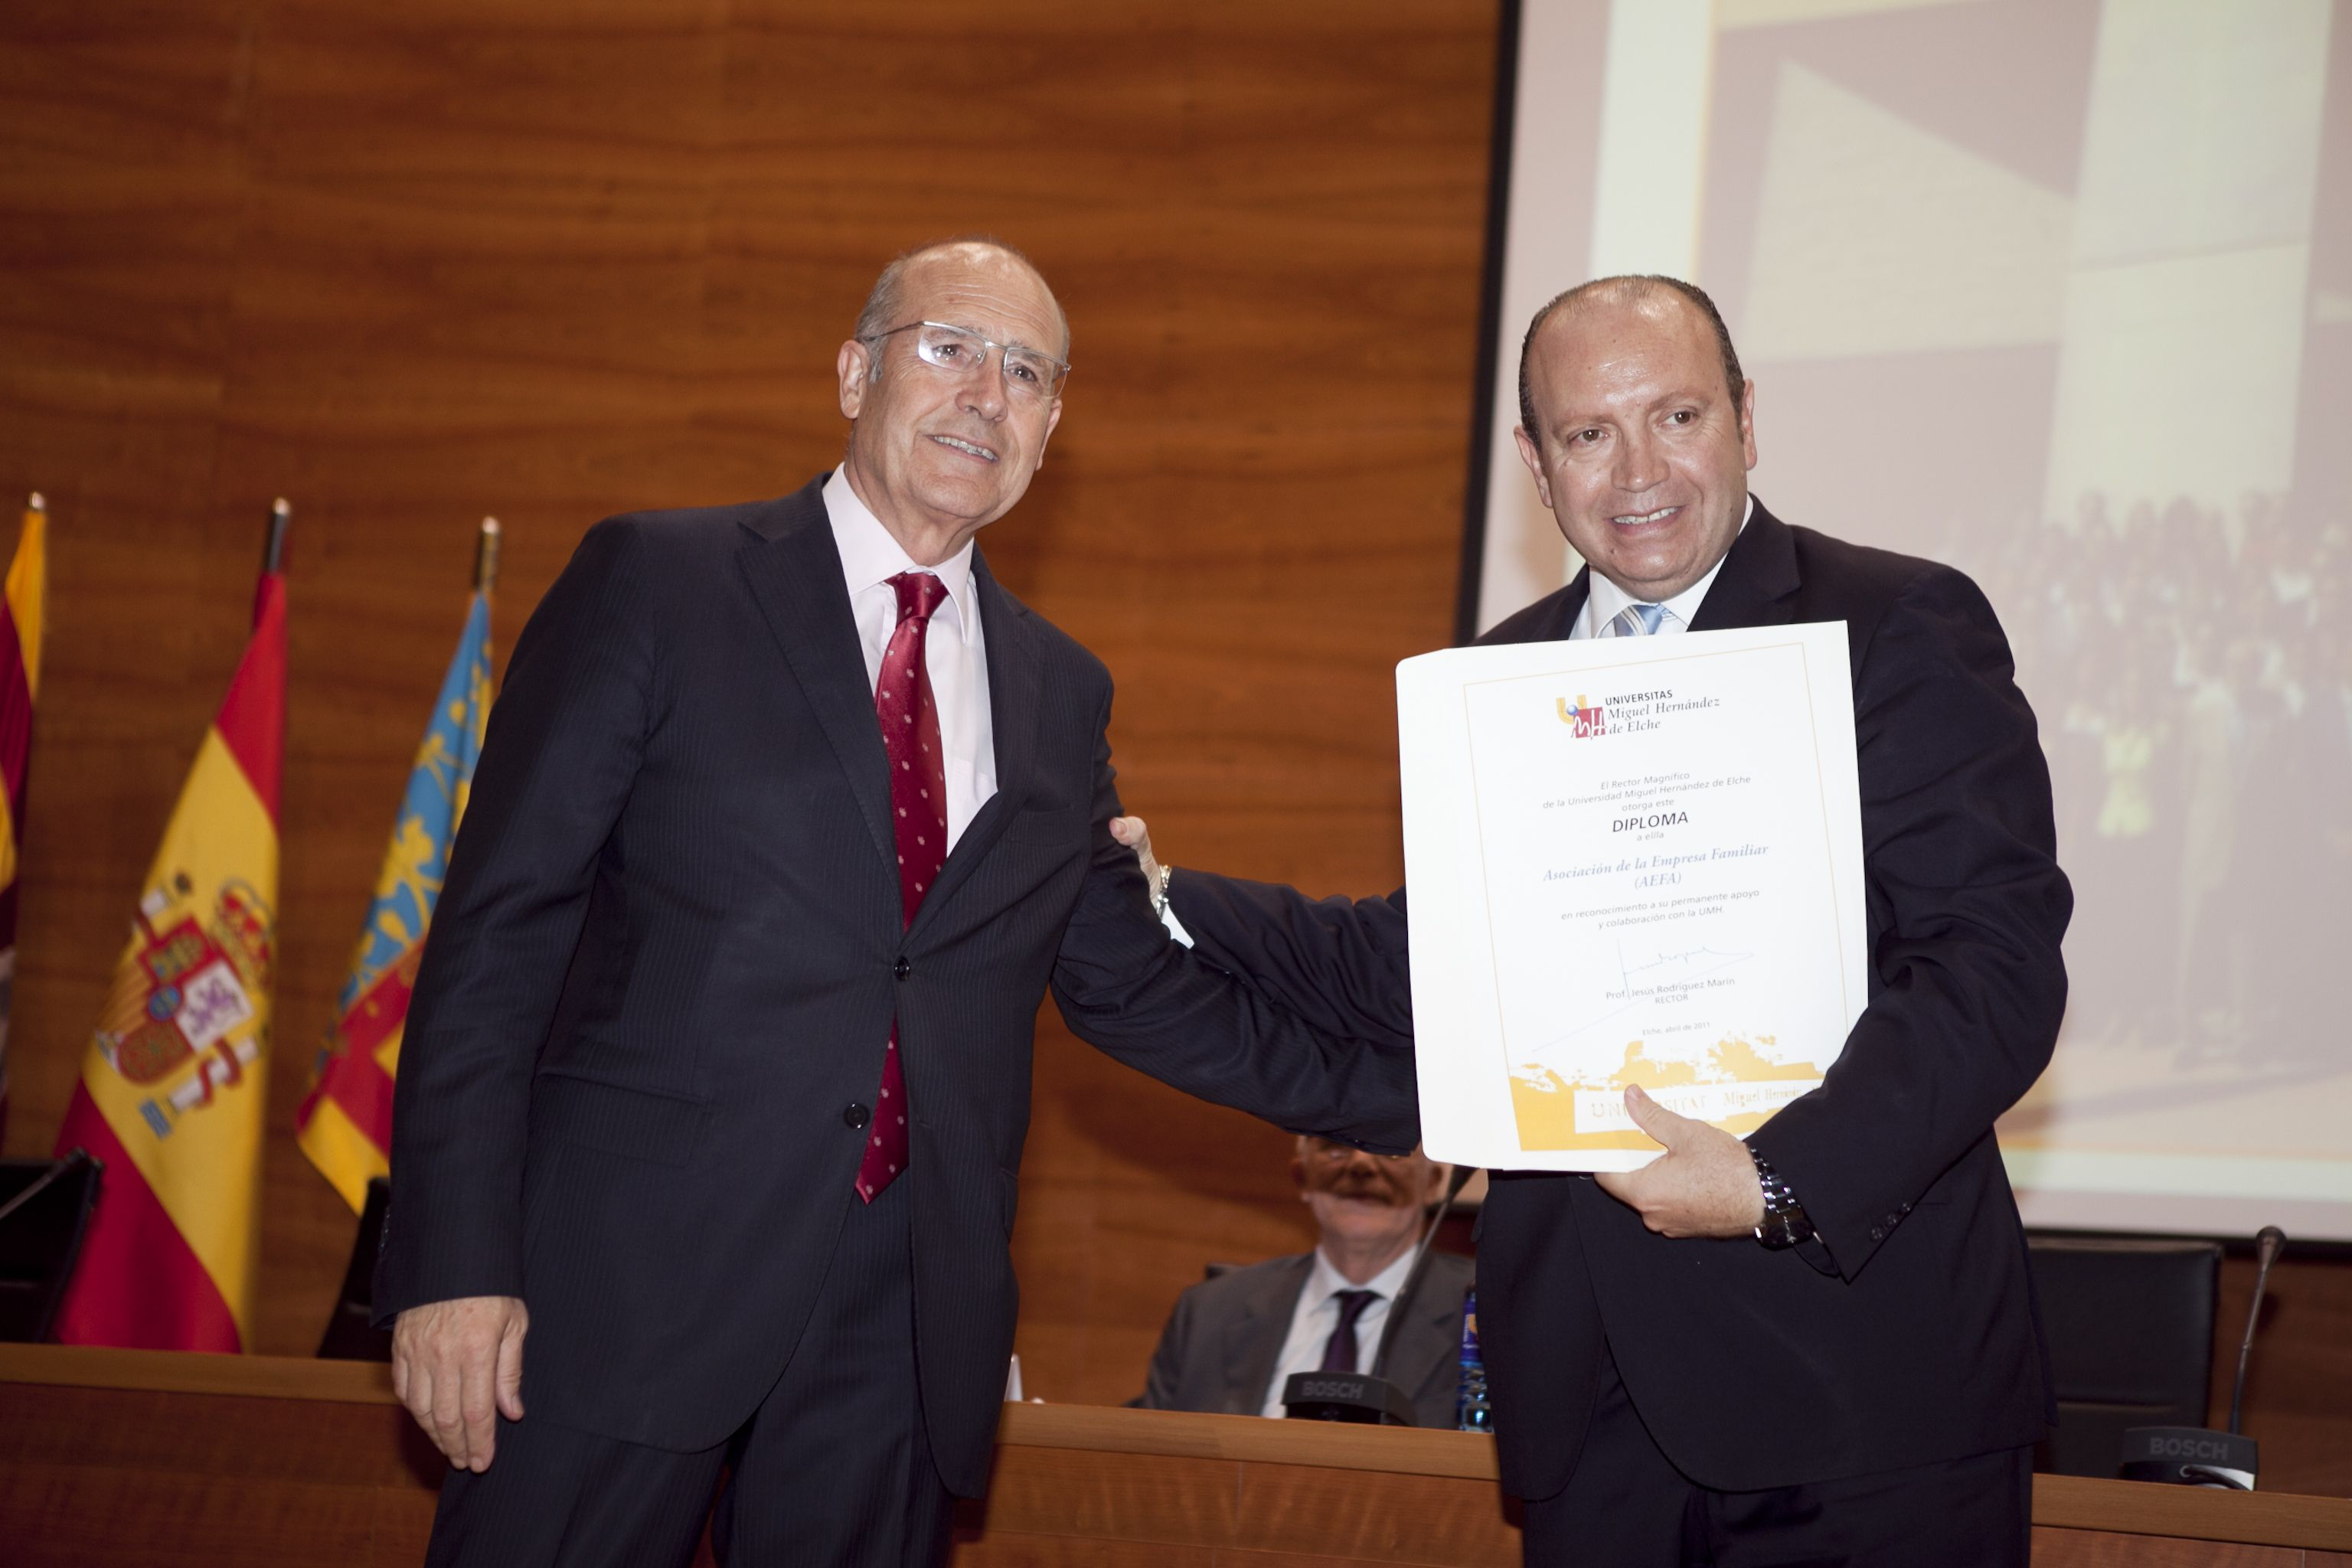 umh-diplomas-rector_mg_6563.jpg